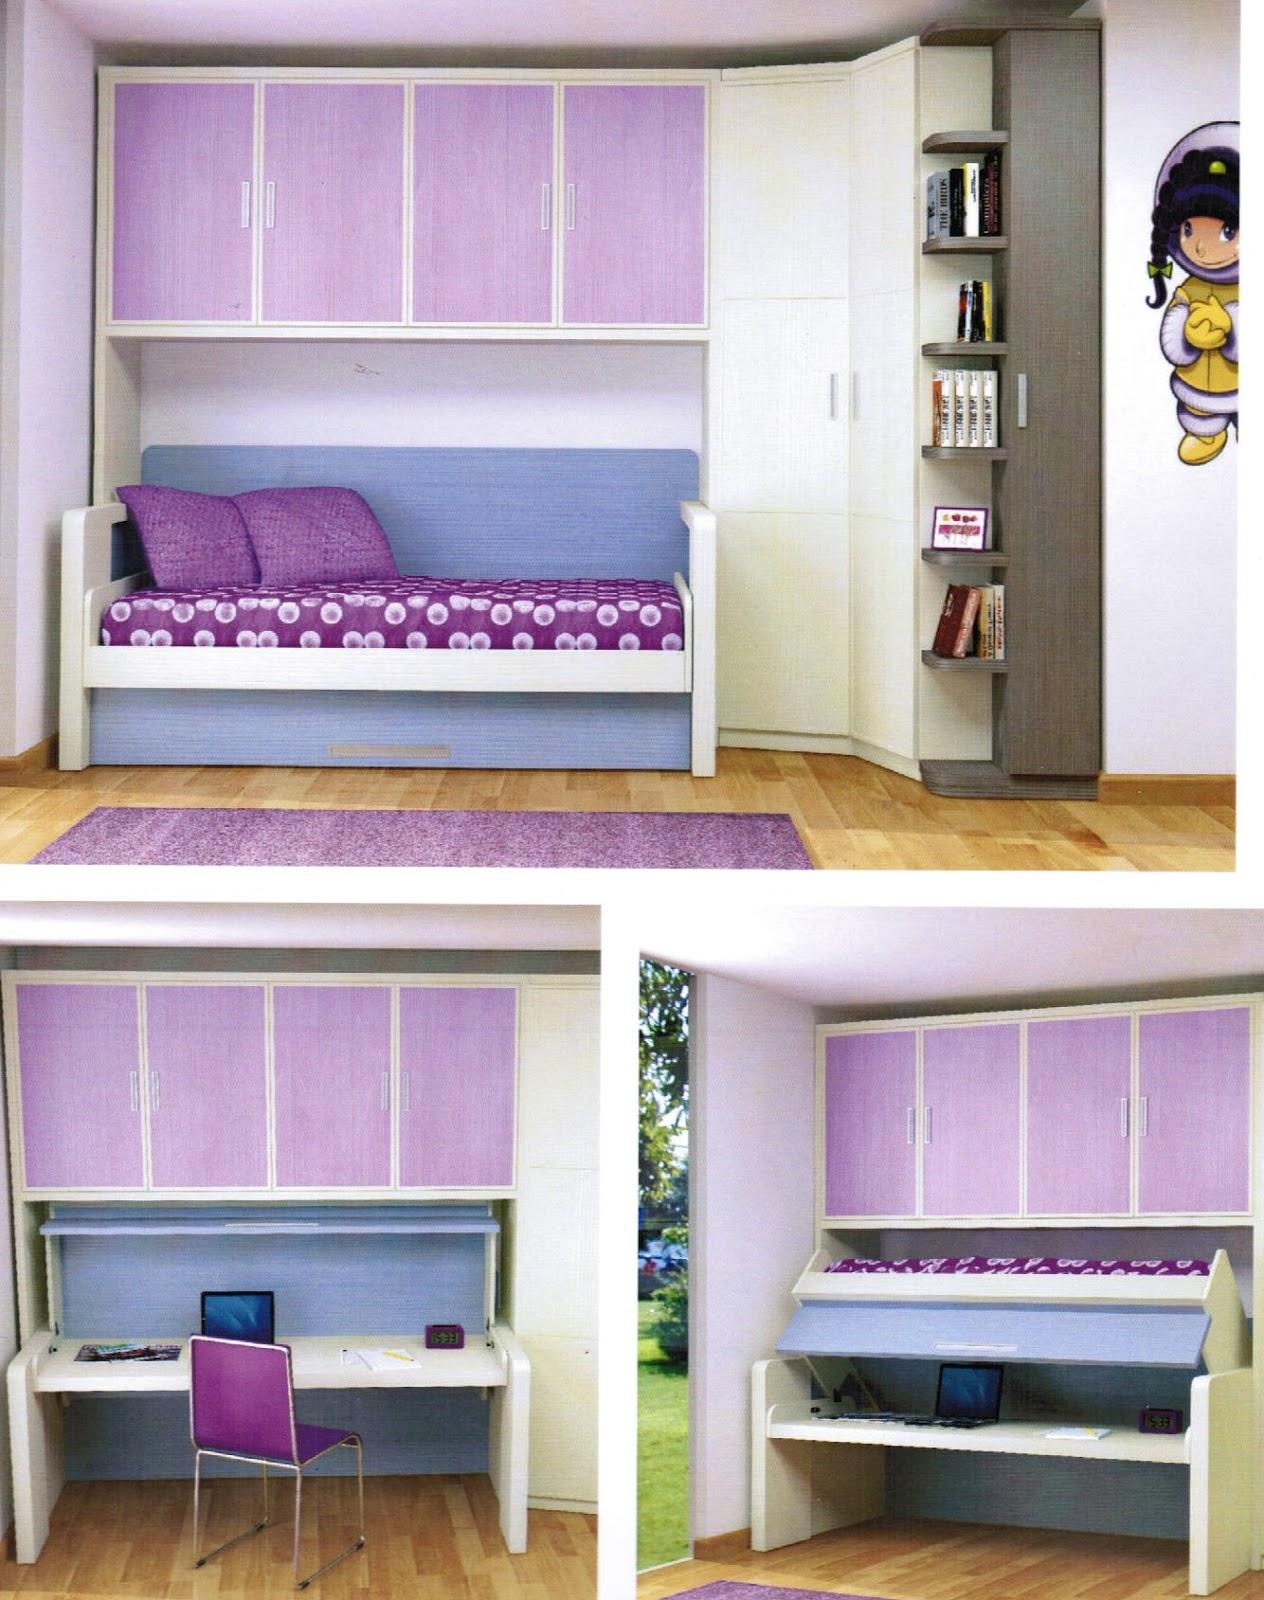 Cama mesa abatible camas autoportantes muebles - Camas abatibles juveniles para espacios reducidos ...